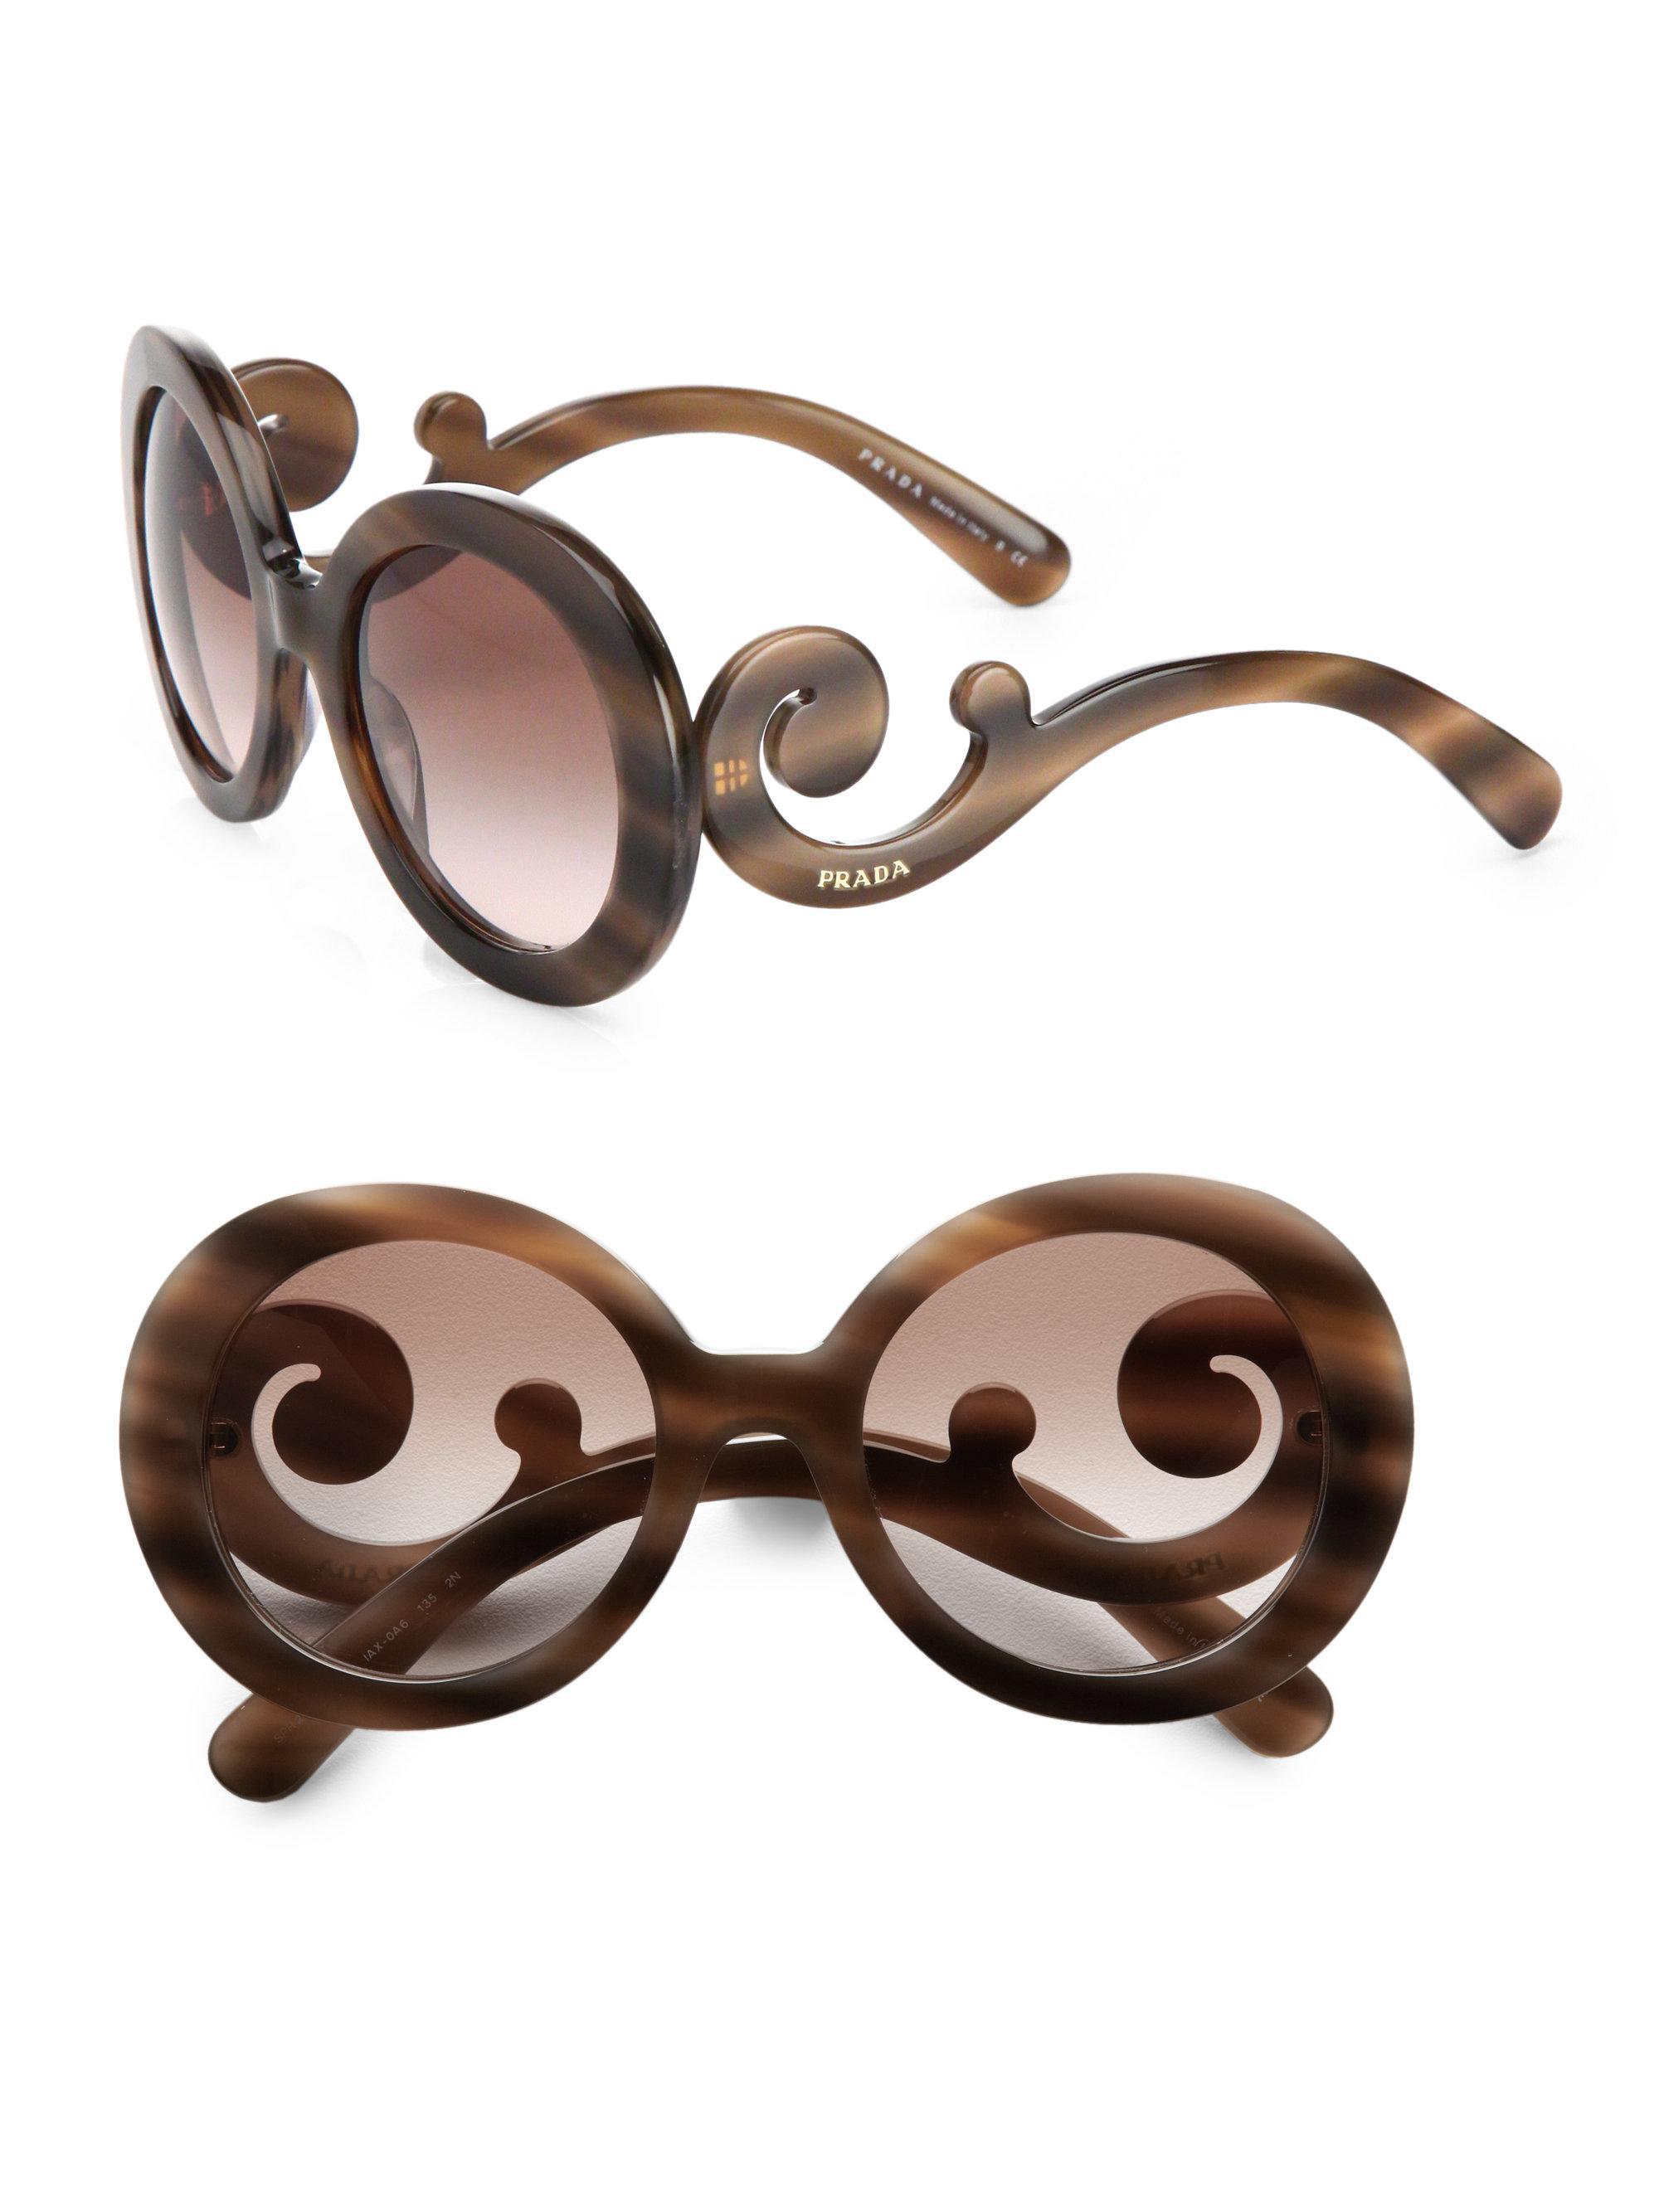 7d7adf6d01e ... clearance lyst prada 55mm baroque round sunglasses in purple 7ff32 de8ed